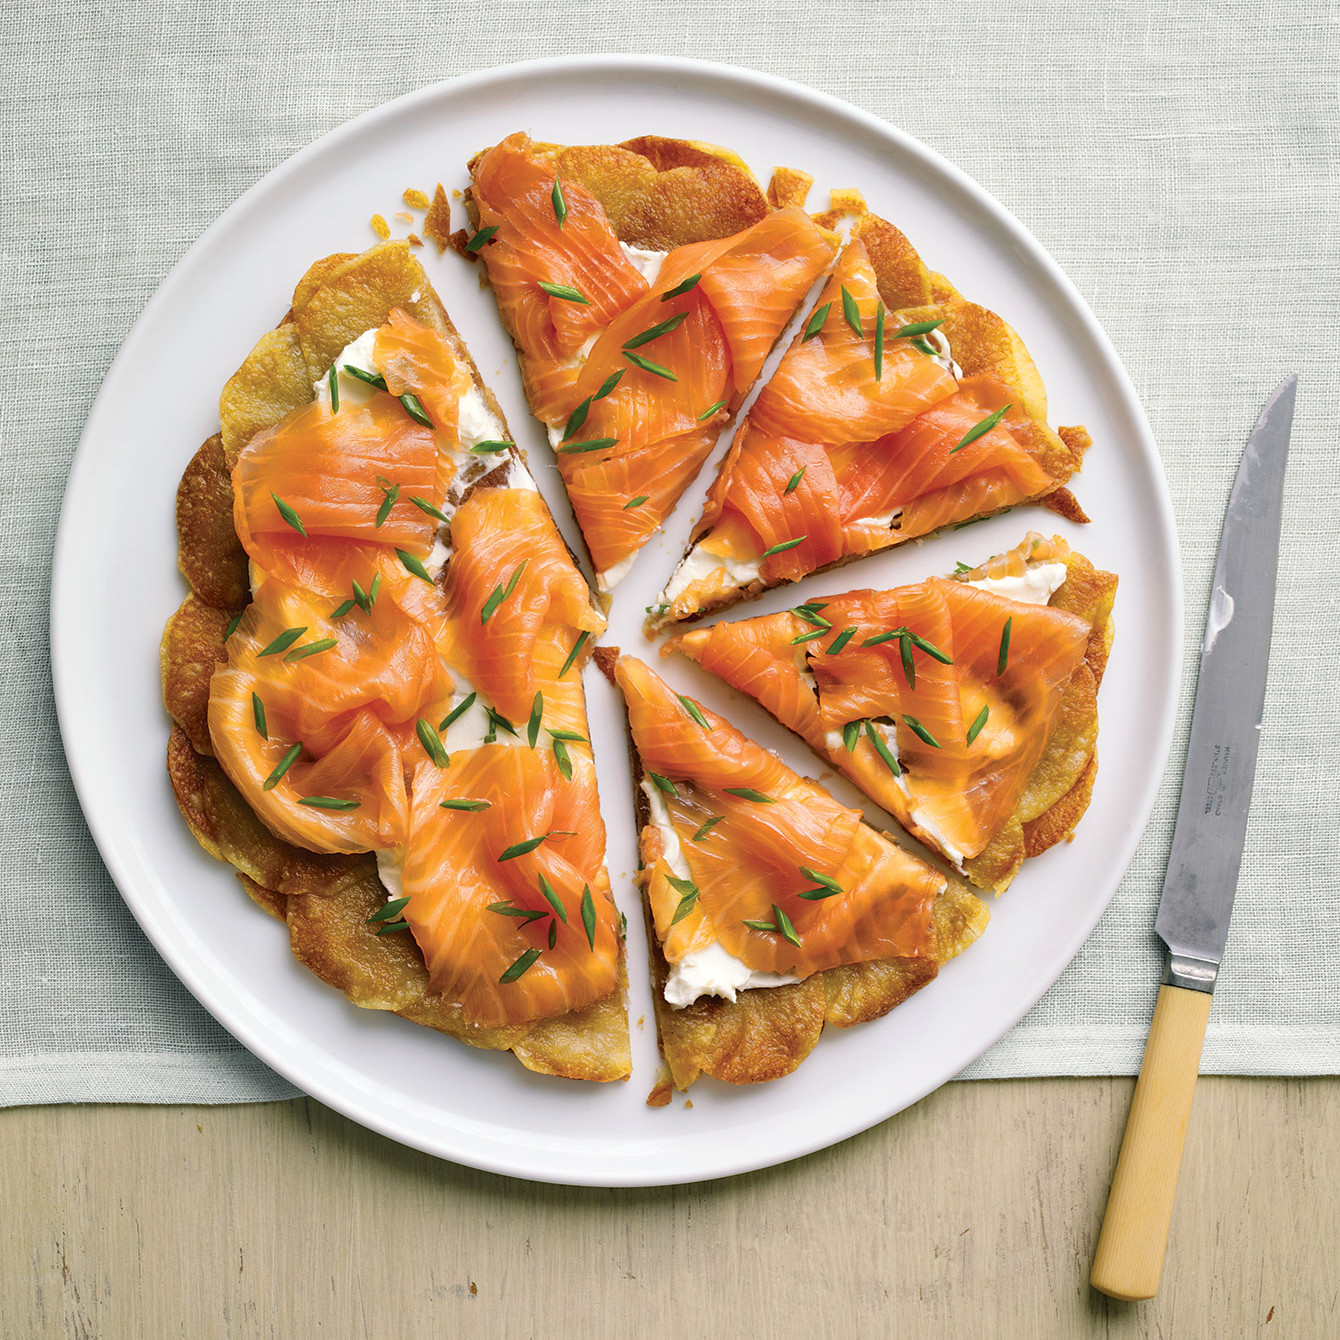 Smoked salmon appetizer recipes easy